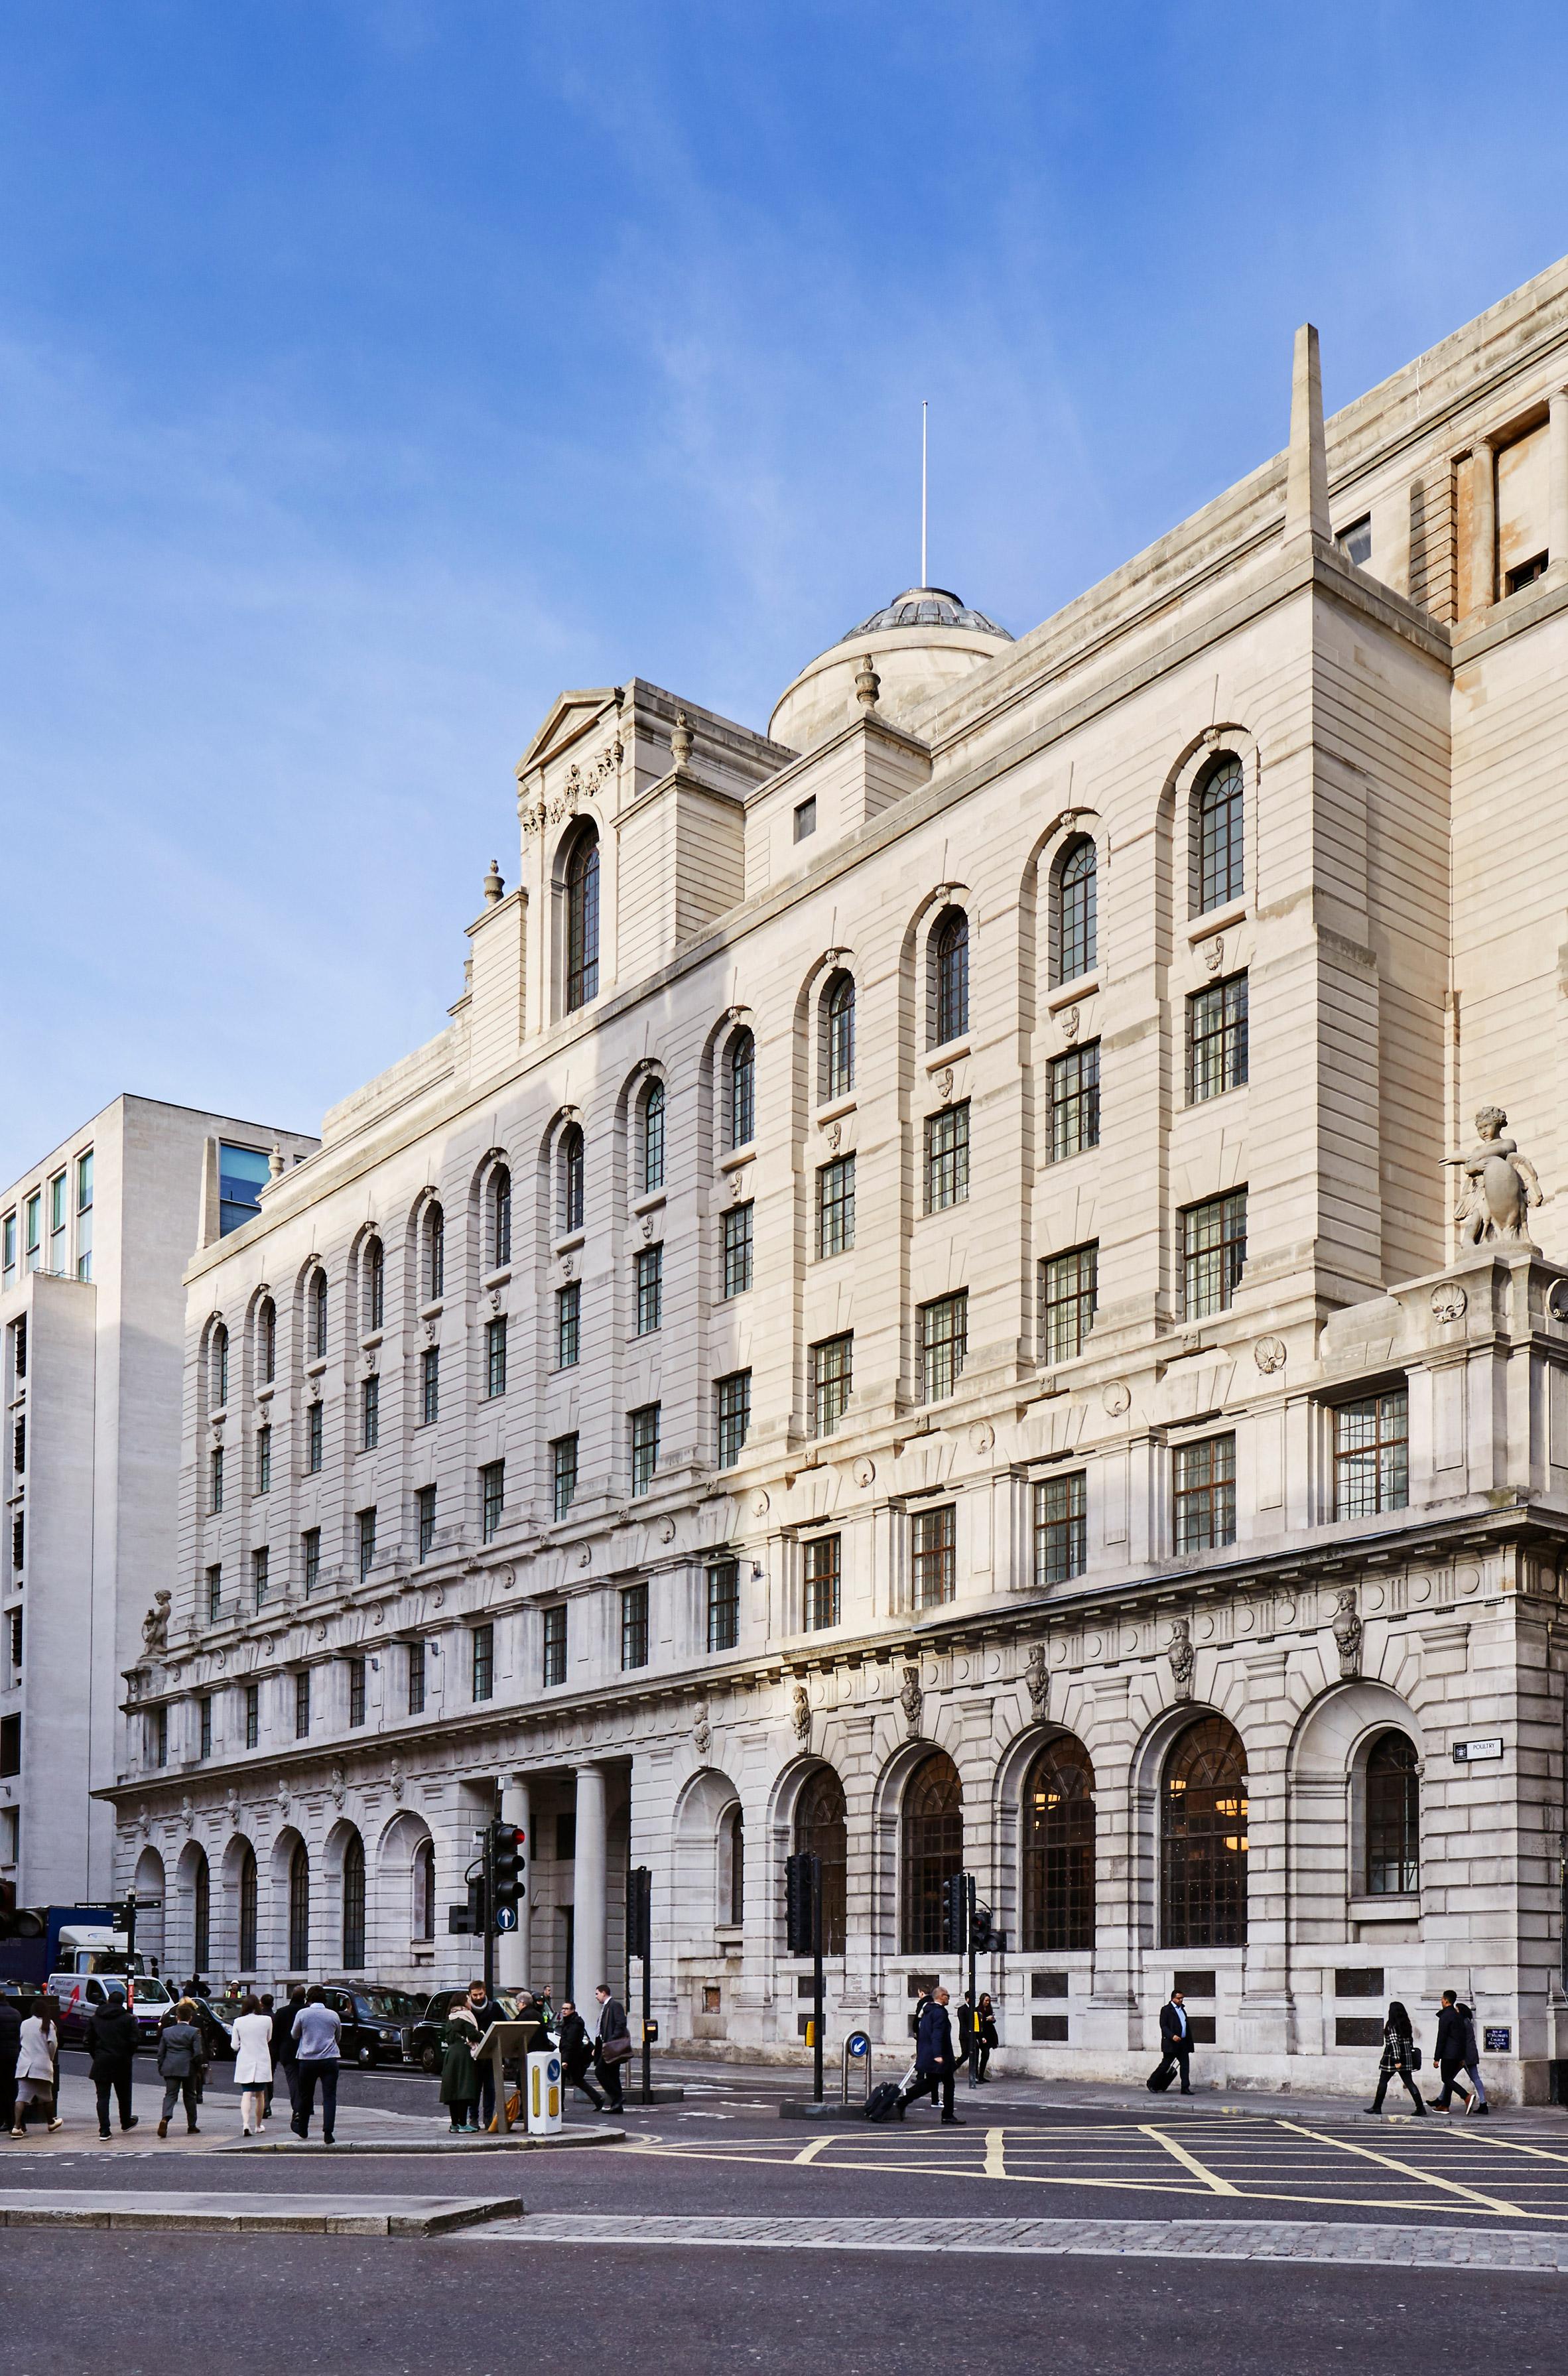 Soho House Shoreditch: Edwin Lutyens' Midland Bank Reopens As Hotel And Members